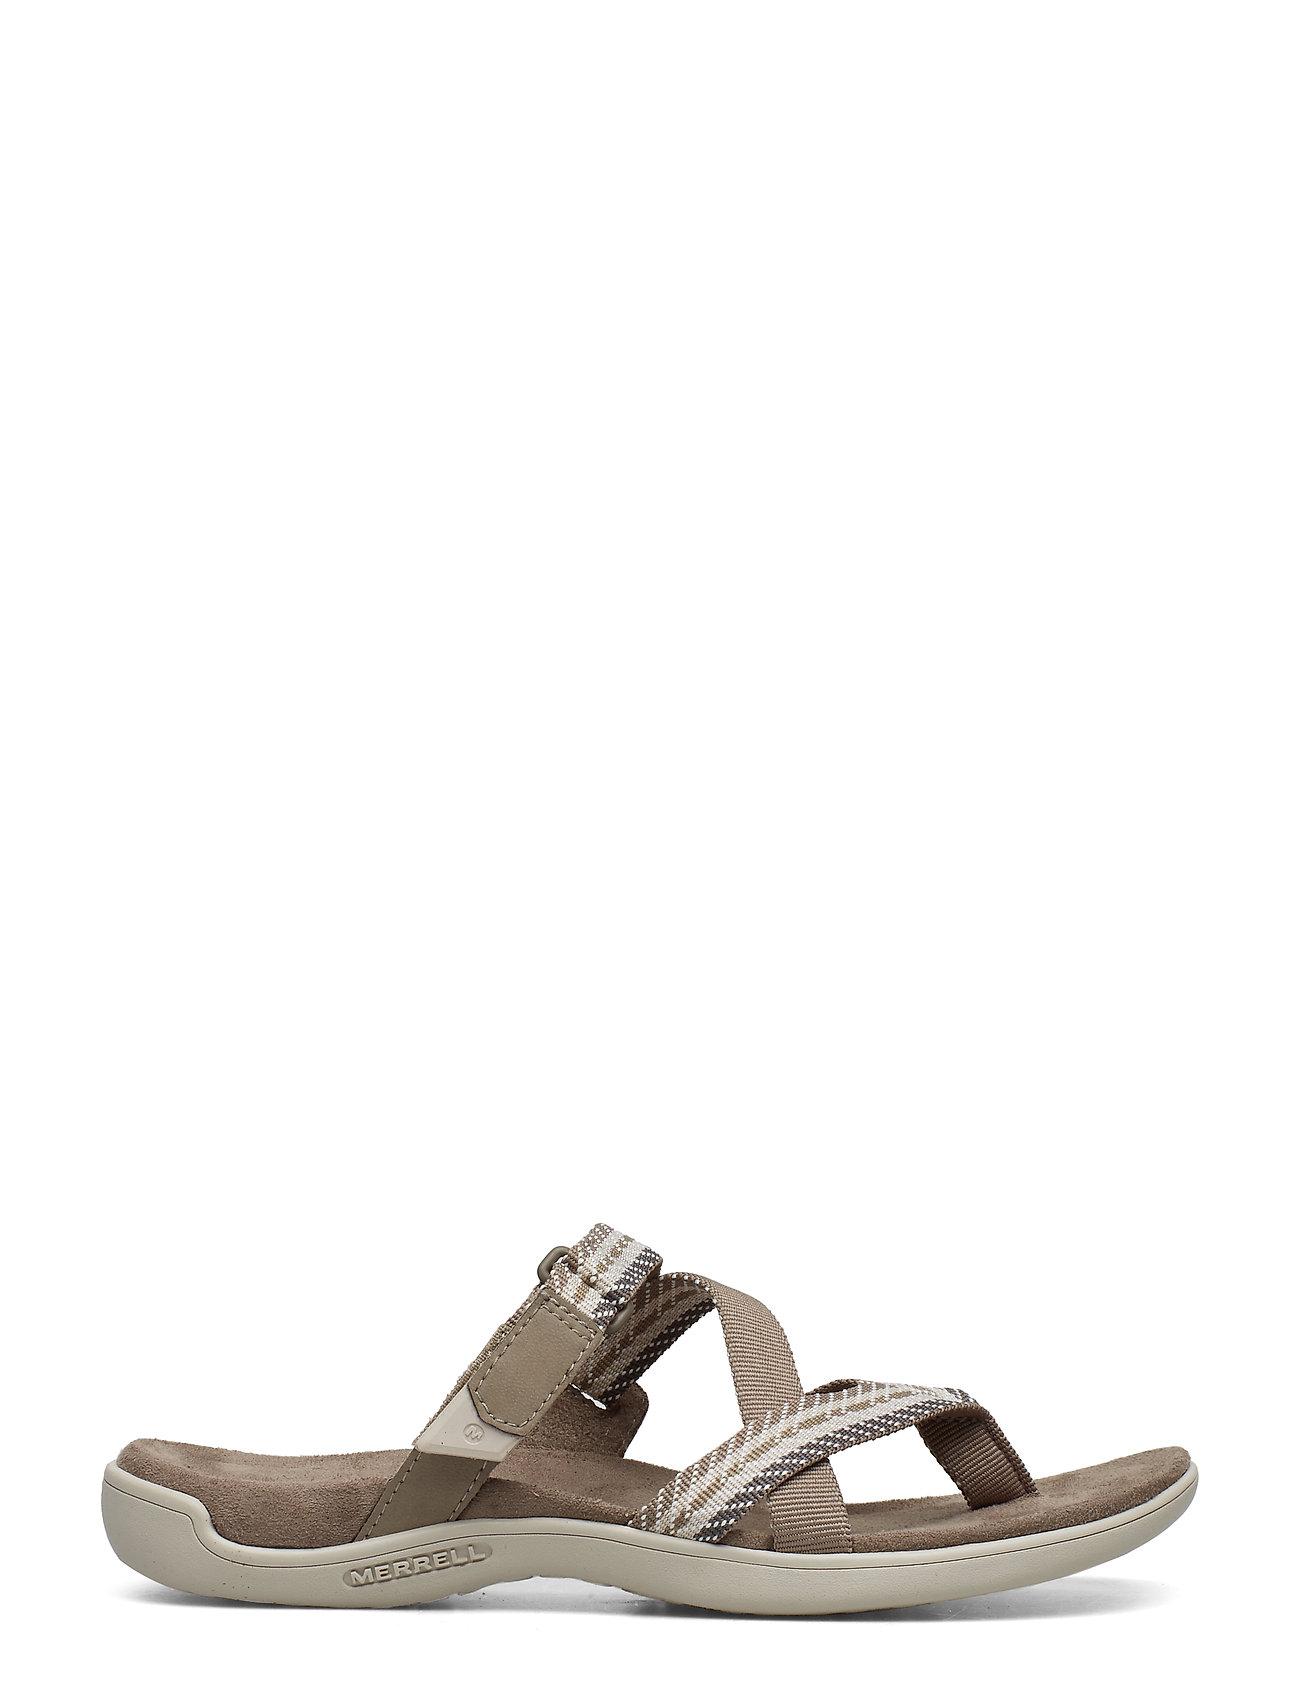 Merrell - District Mendi Thong Brindle - hiking sandals - brindle - 1